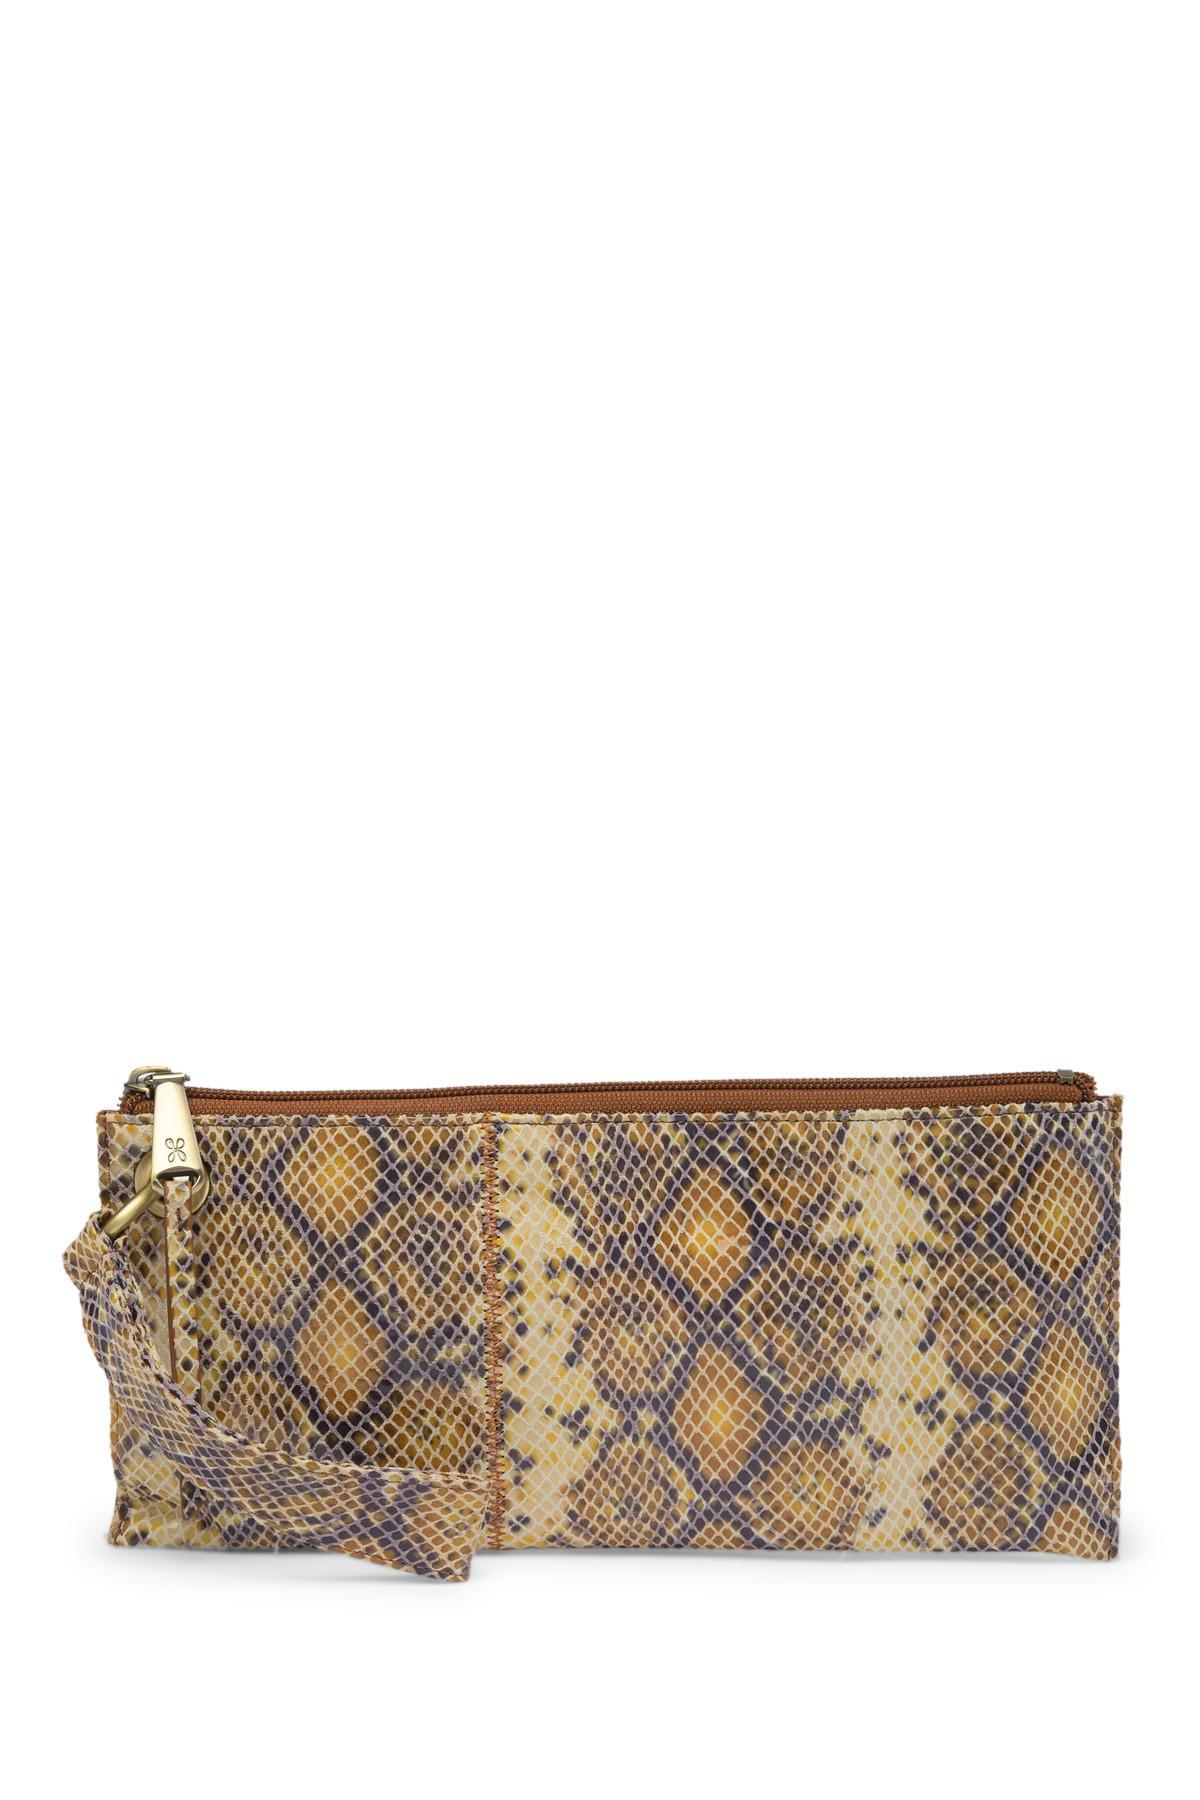 a333d61643 Hobo. Women s Vida Leather Wristlet